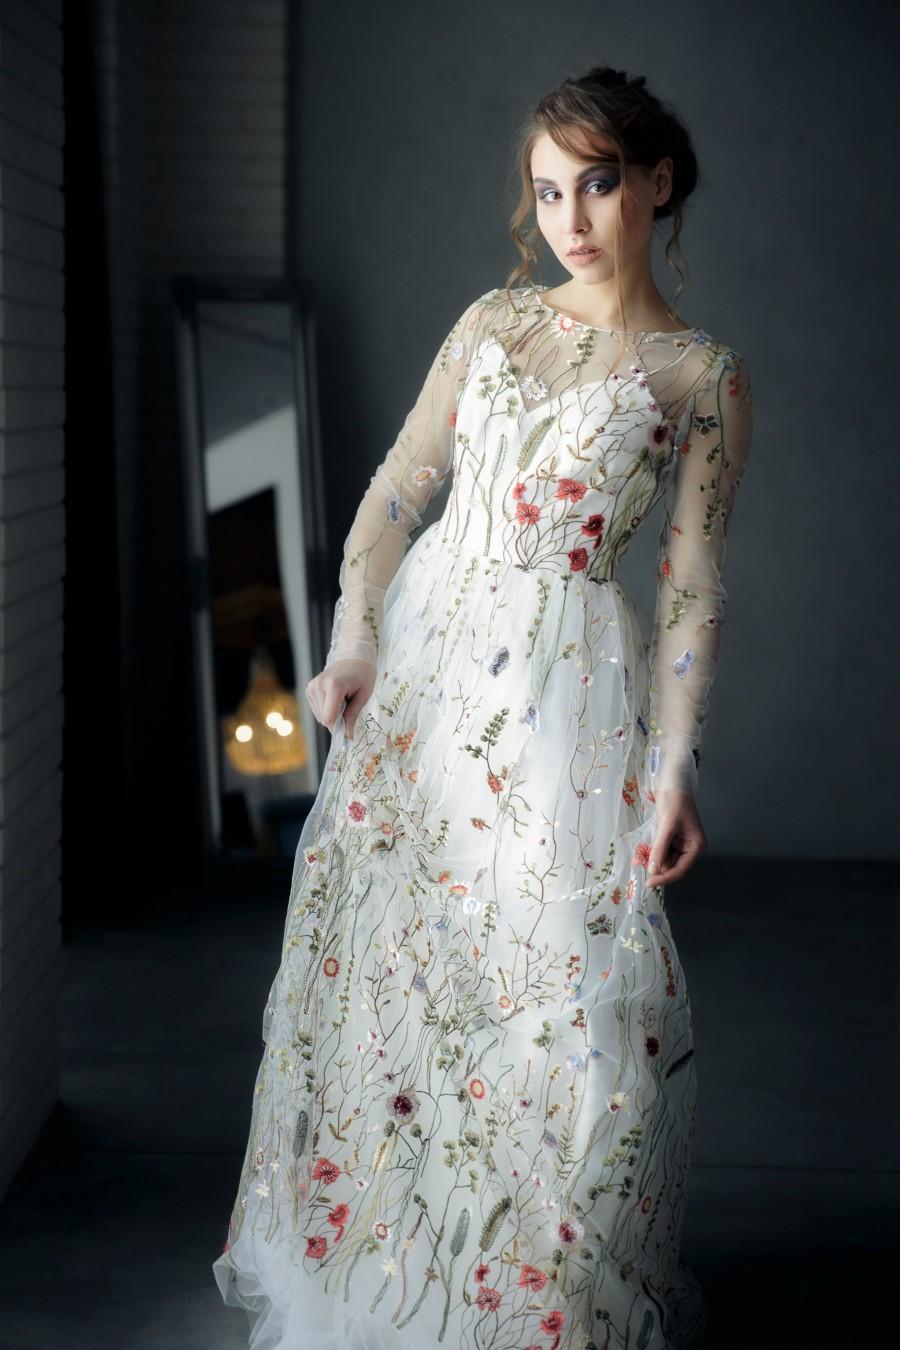 Embroidered Wedding Dress.Flower Wedding Dress Wedding Dress With Flowers Wedding